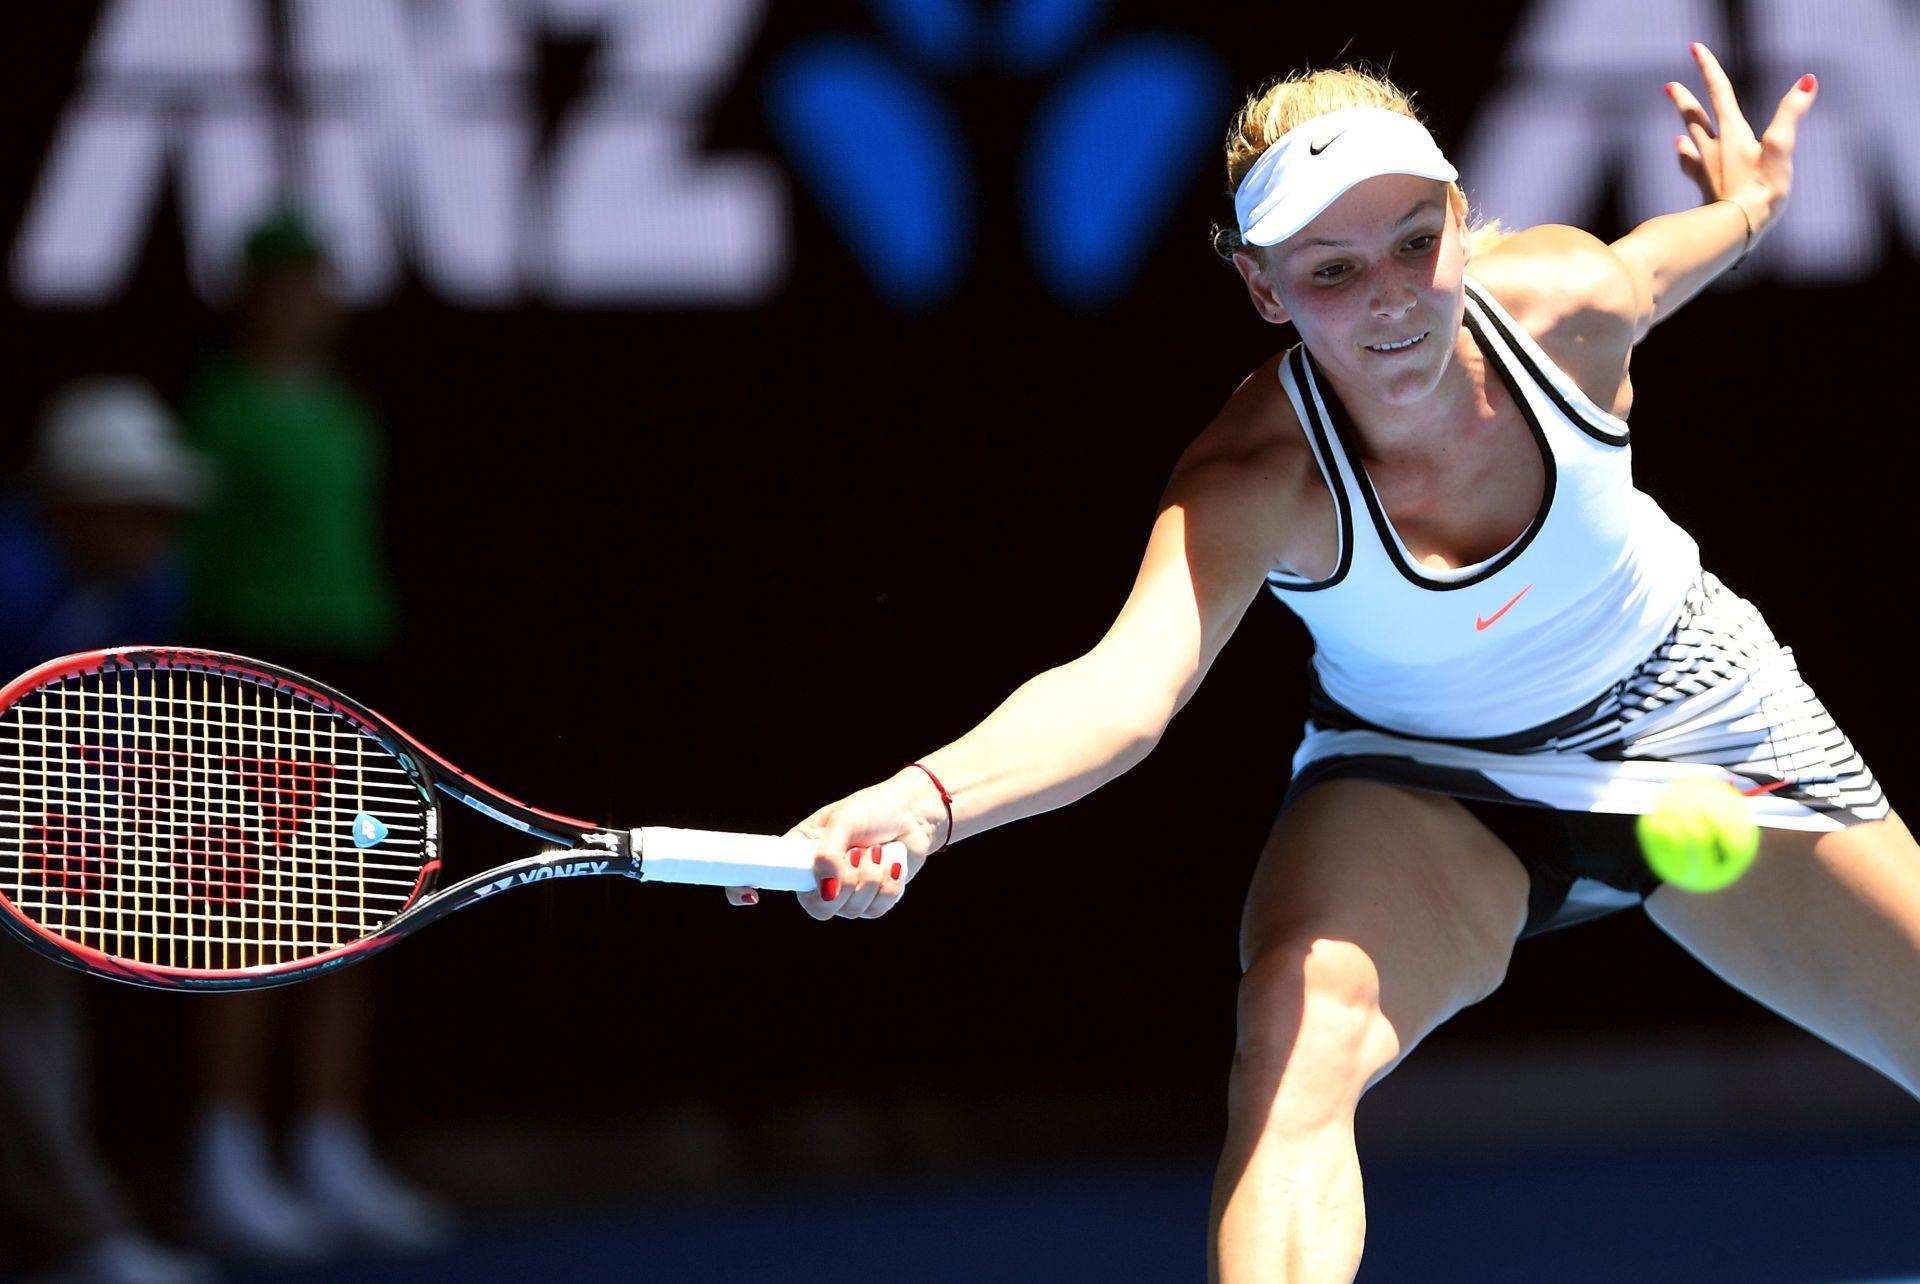 WTA TURNIRI: Pobjede Konjuh i Vekić